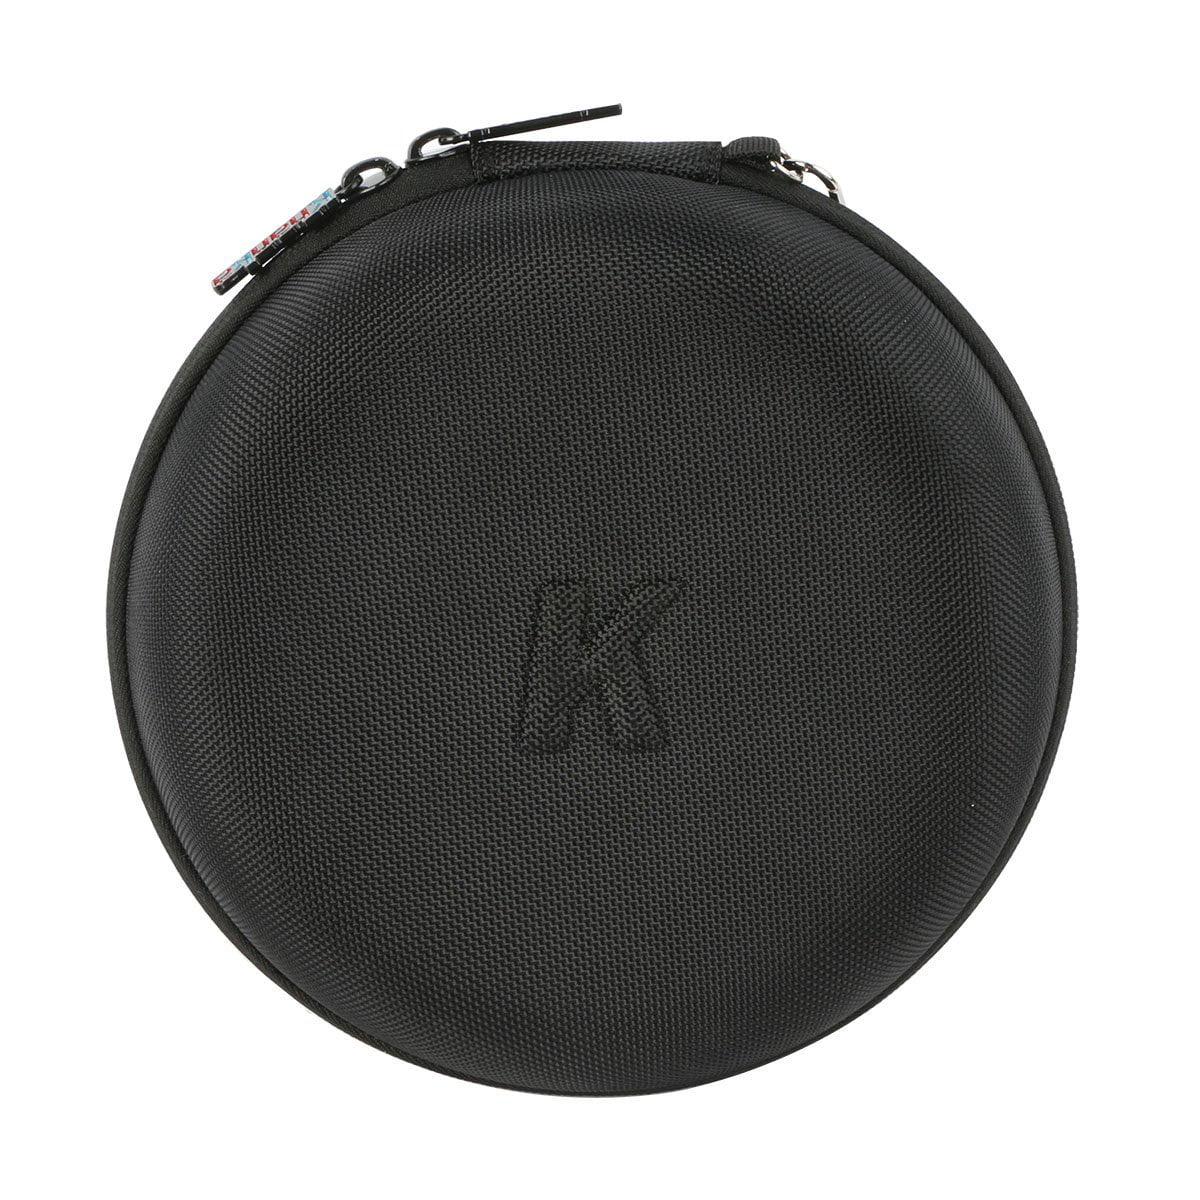 khanka hard case travel storage bag for sennheiser hd 202 ii professional studio monitor. Black Bedroom Furniture Sets. Home Design Ideas